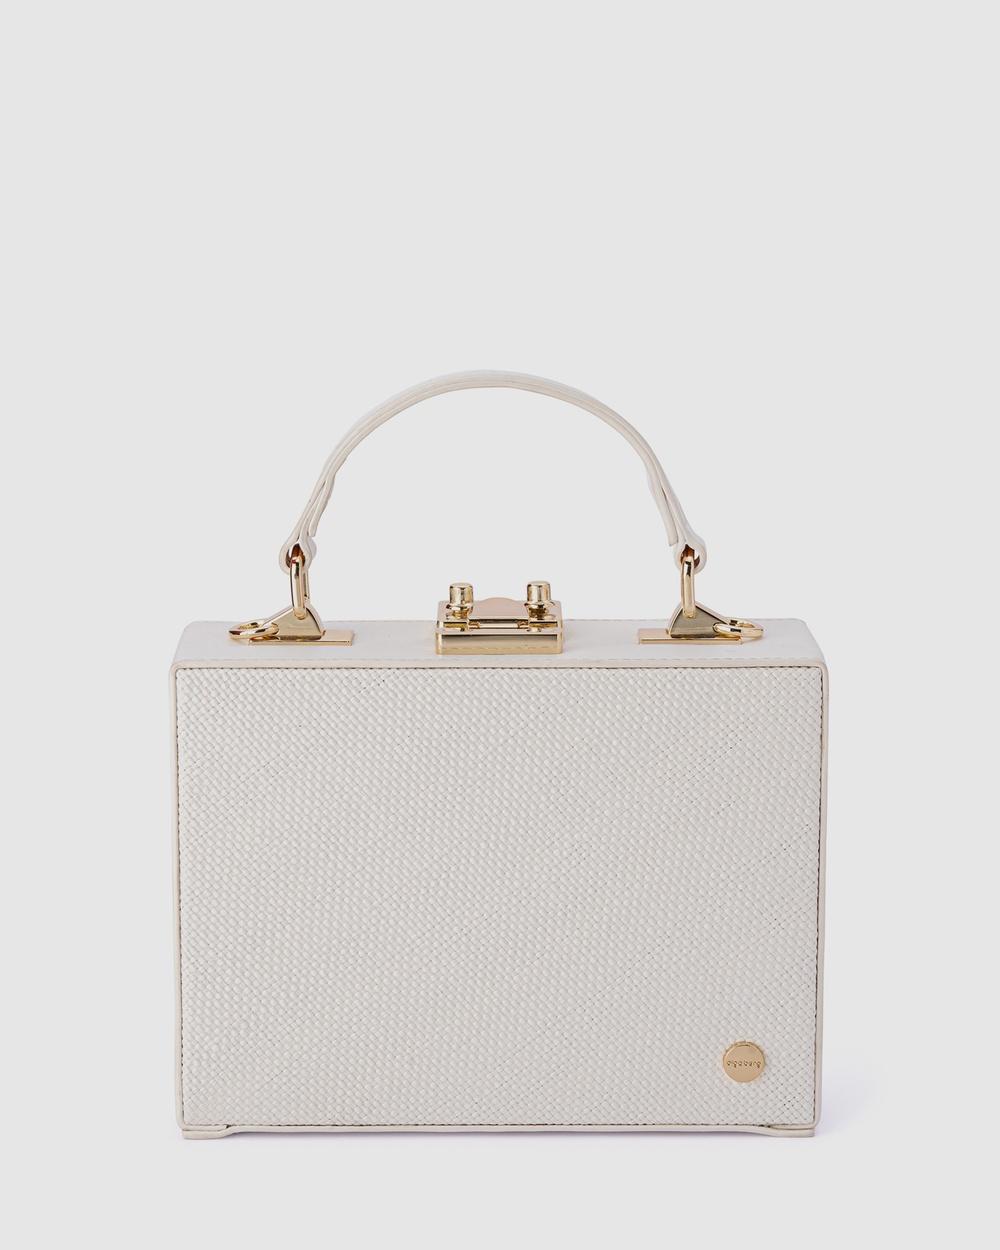 Olga Berg Georgia Straw Weave Top Handle Handbags White Handbags Australia